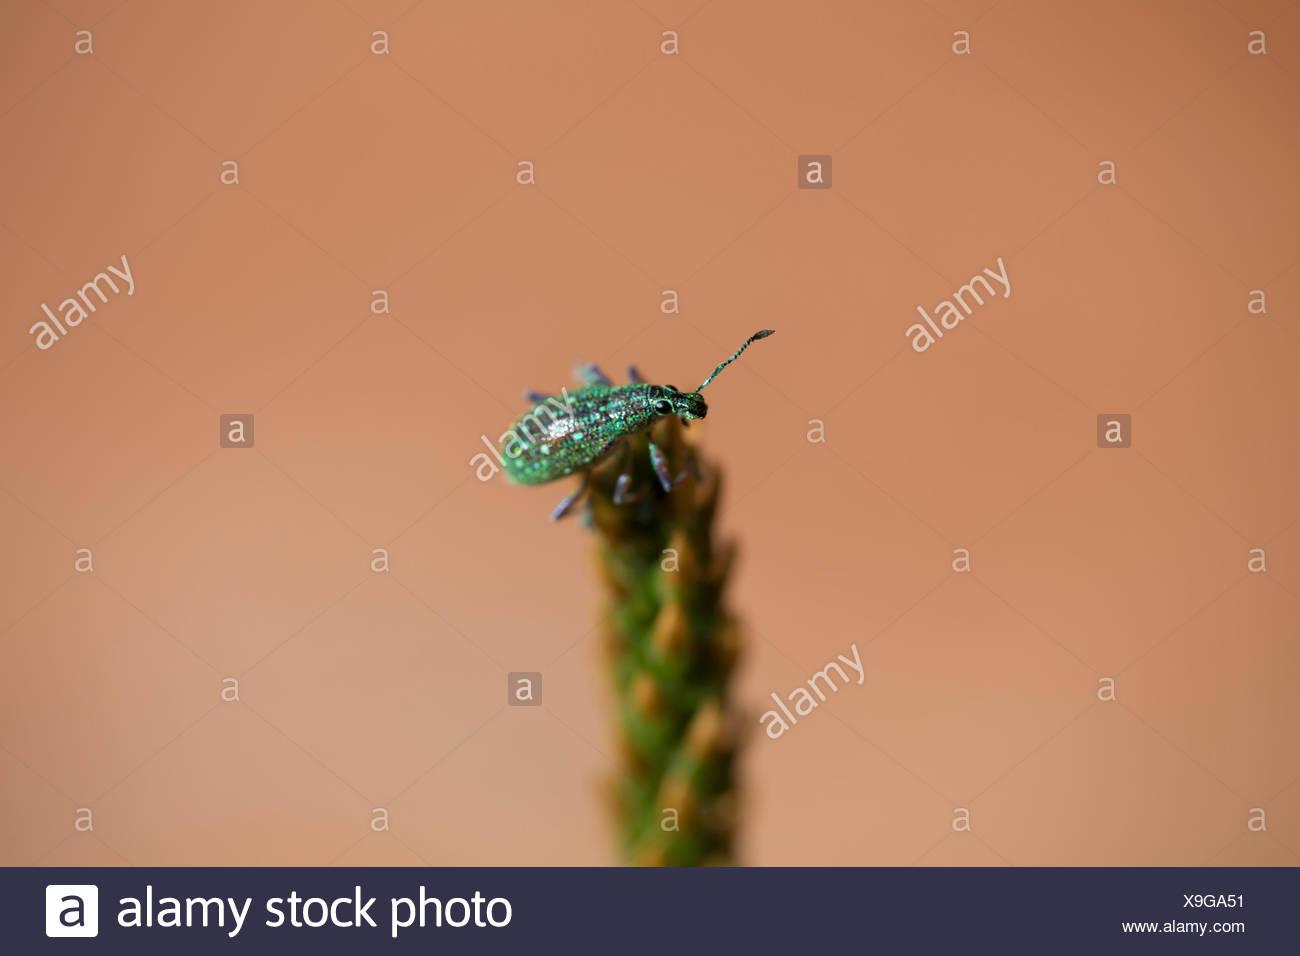 insect, branch, antenna, maddening, pert, coquettish, cute, rainforest, rain - Stock Image